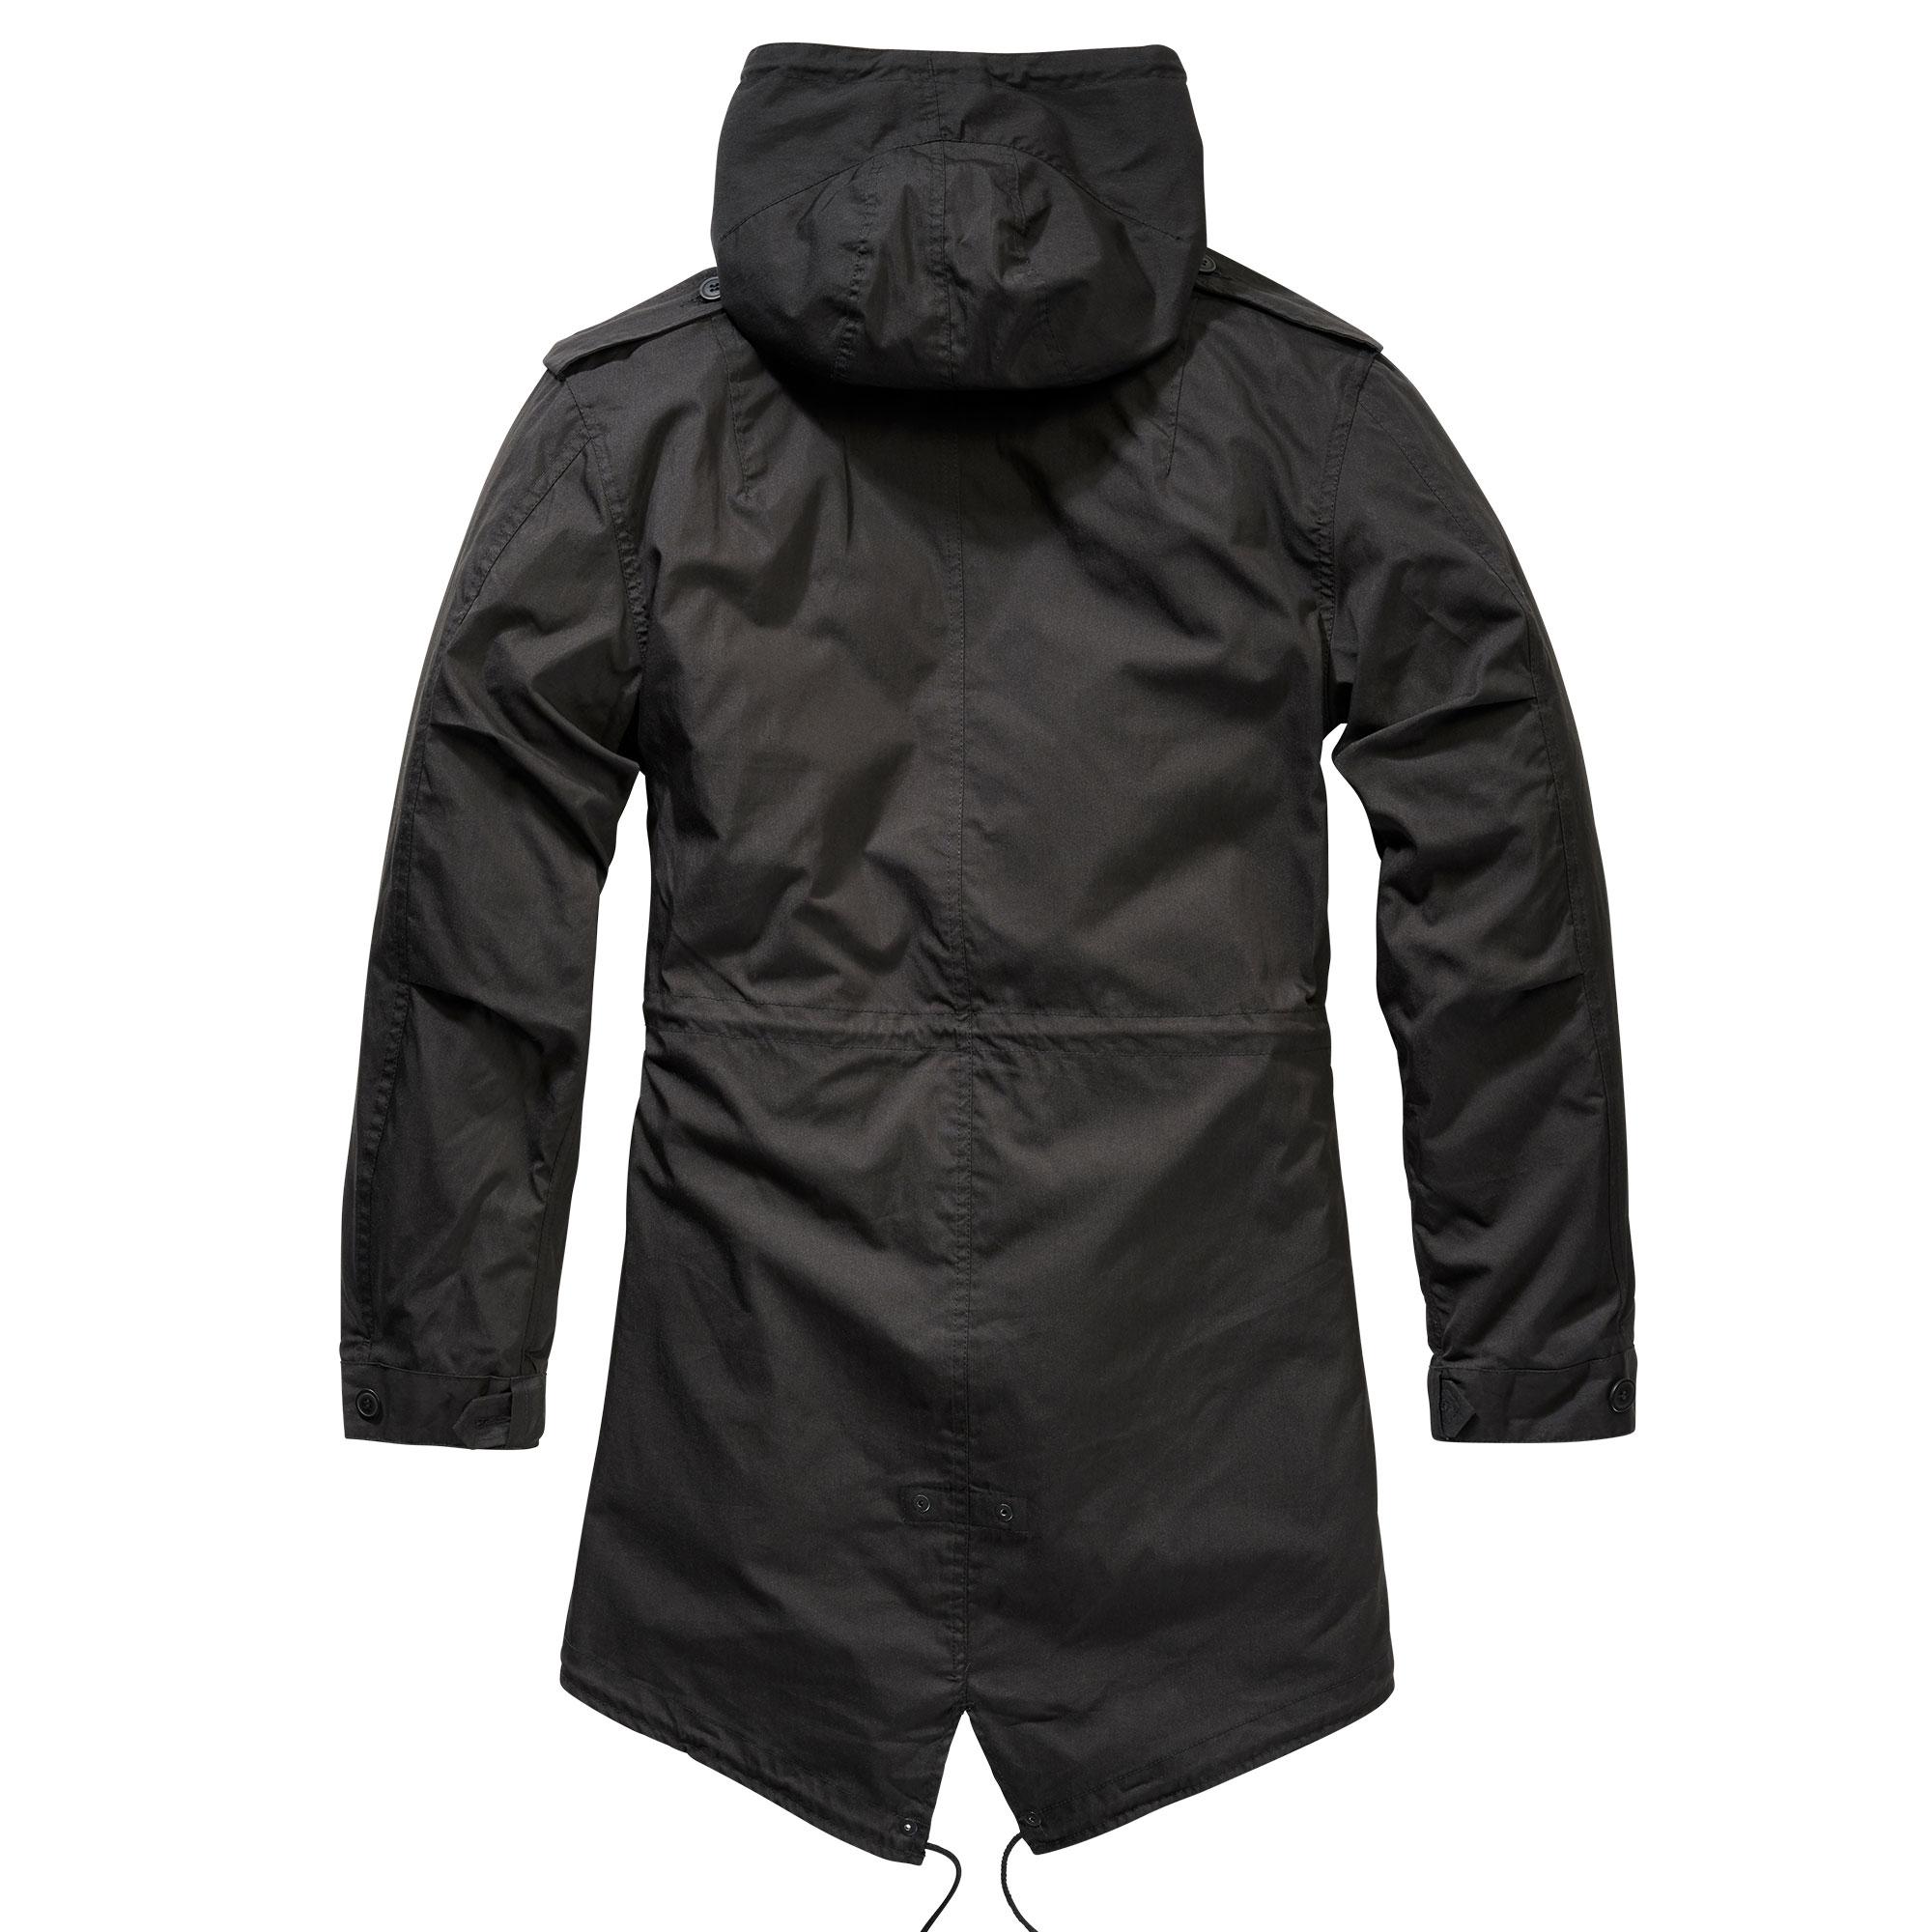 Indexbild 4 - Brandit US M51 Parka Winterjacke Fishtail Jacke Gefüttert Armee S-5XL